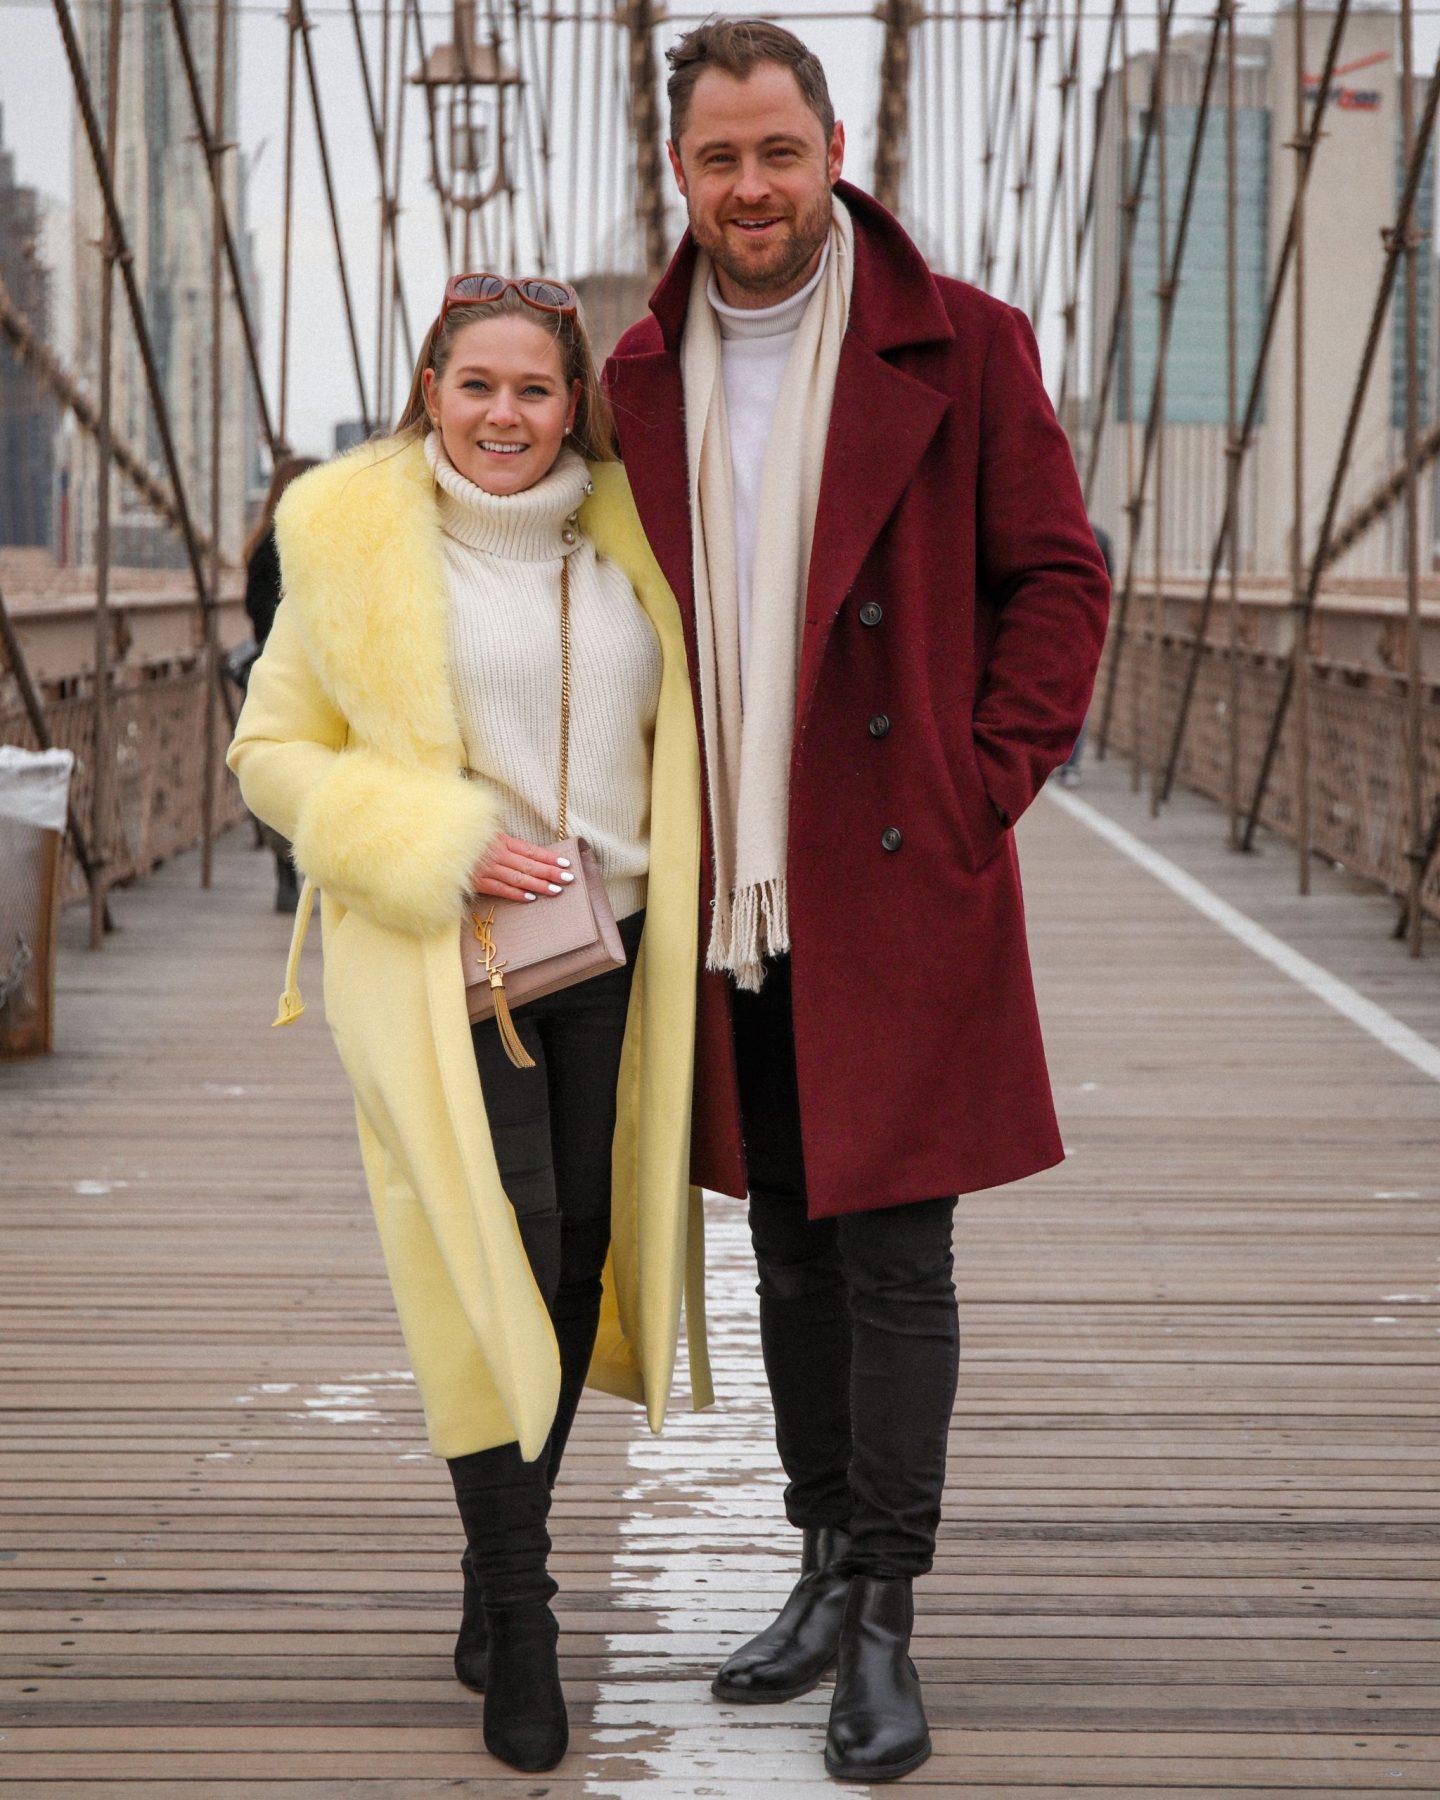 Brooklyn Bridge, DUMBO, New York City, Ben and Katie Heath, KALANCHOE